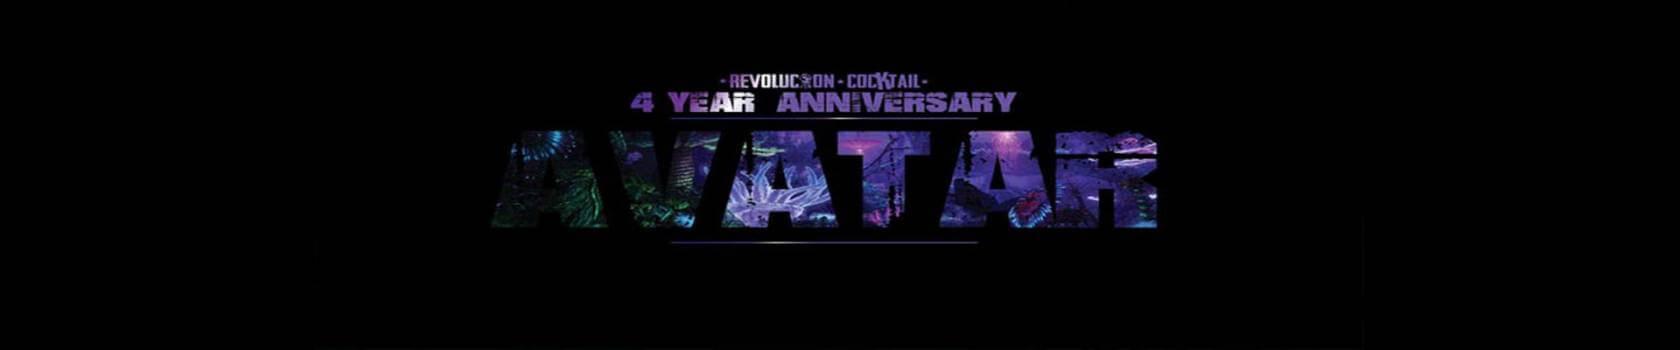 Revolucion Cocktail 4 Year Anniversary - Avatar Night